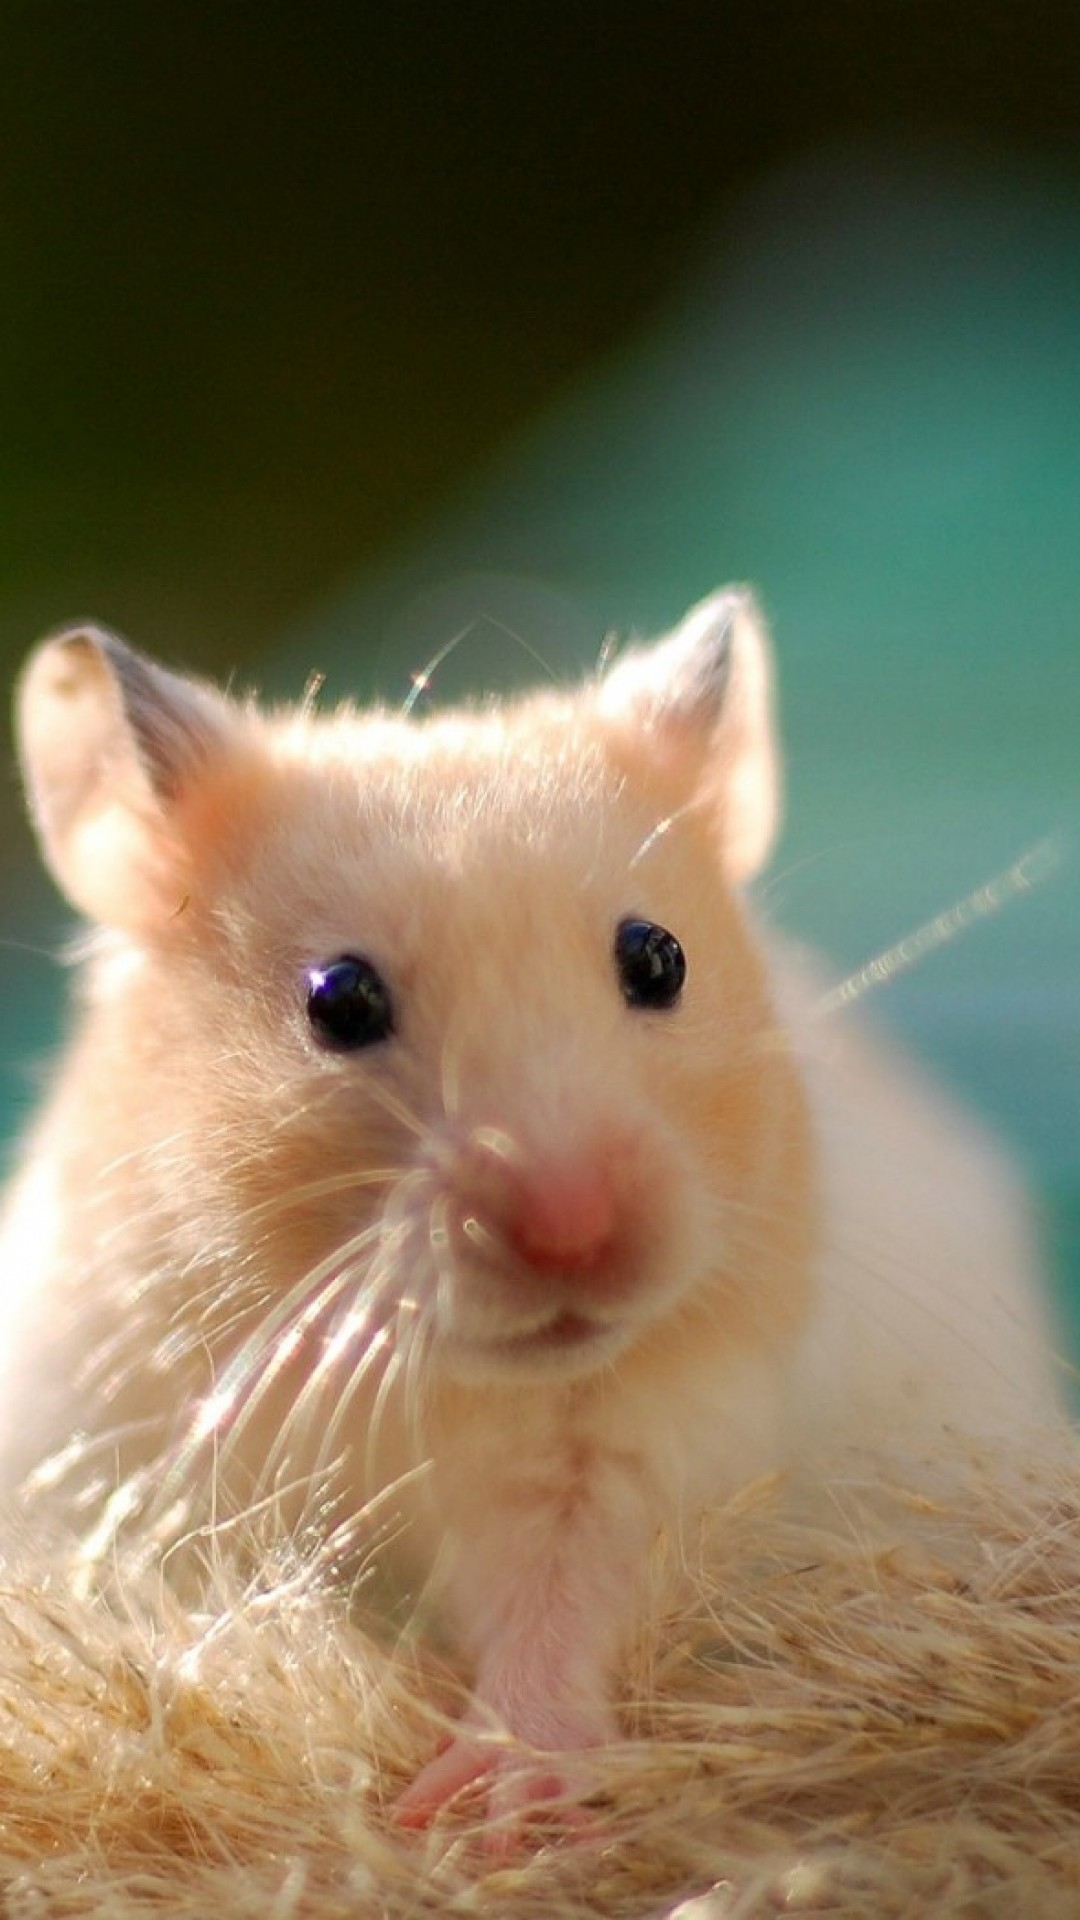 Cute xhamster